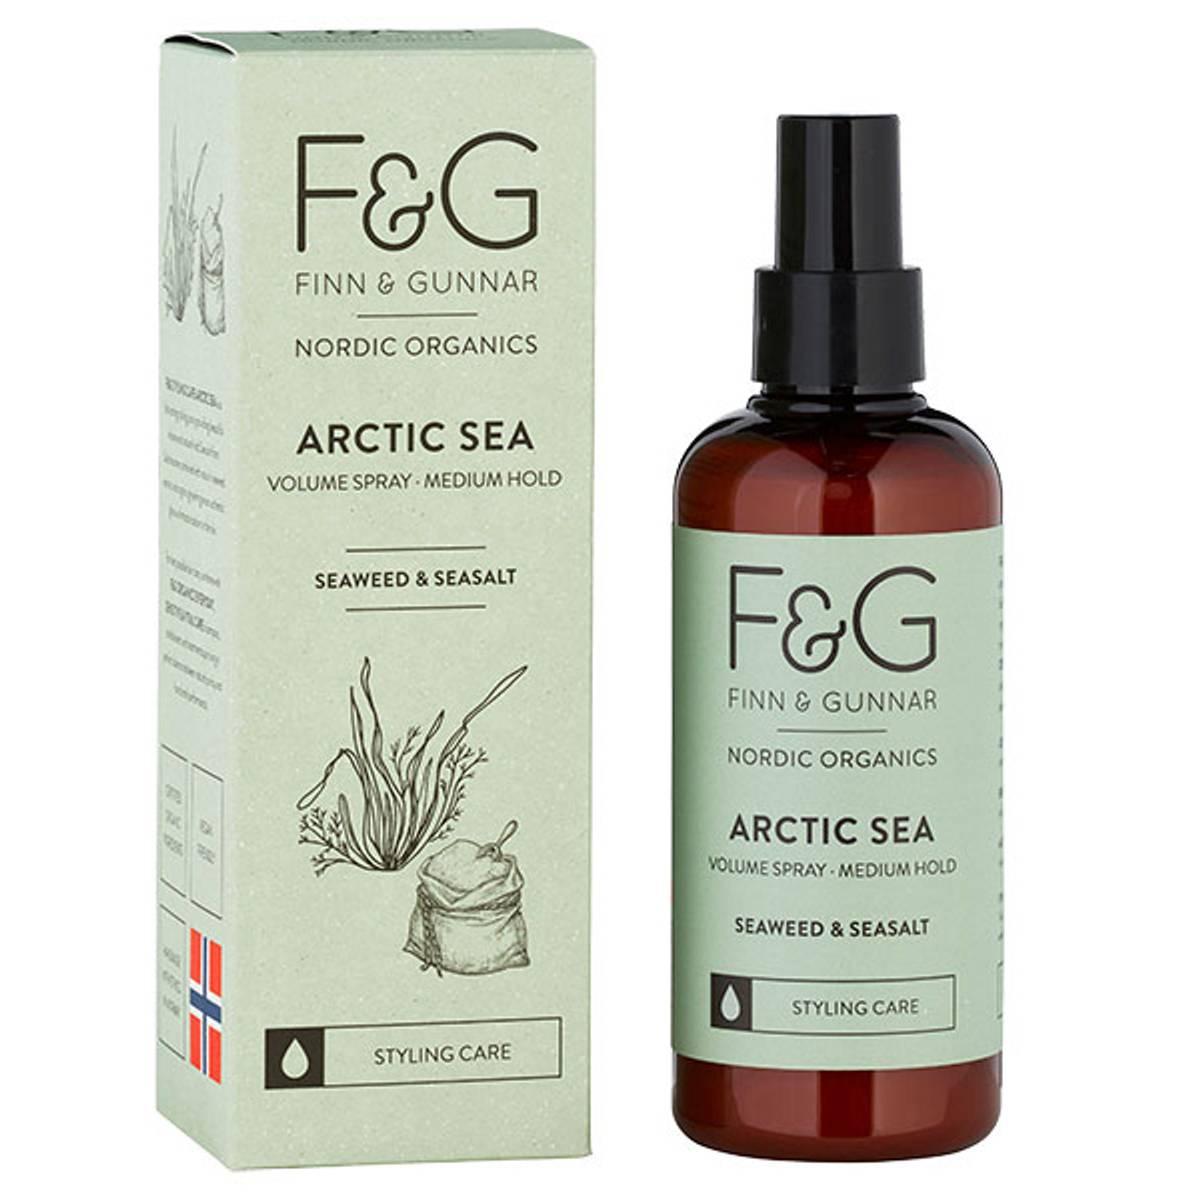 F&G Nordic Organics Artic Sea Volume Spray 200 ml